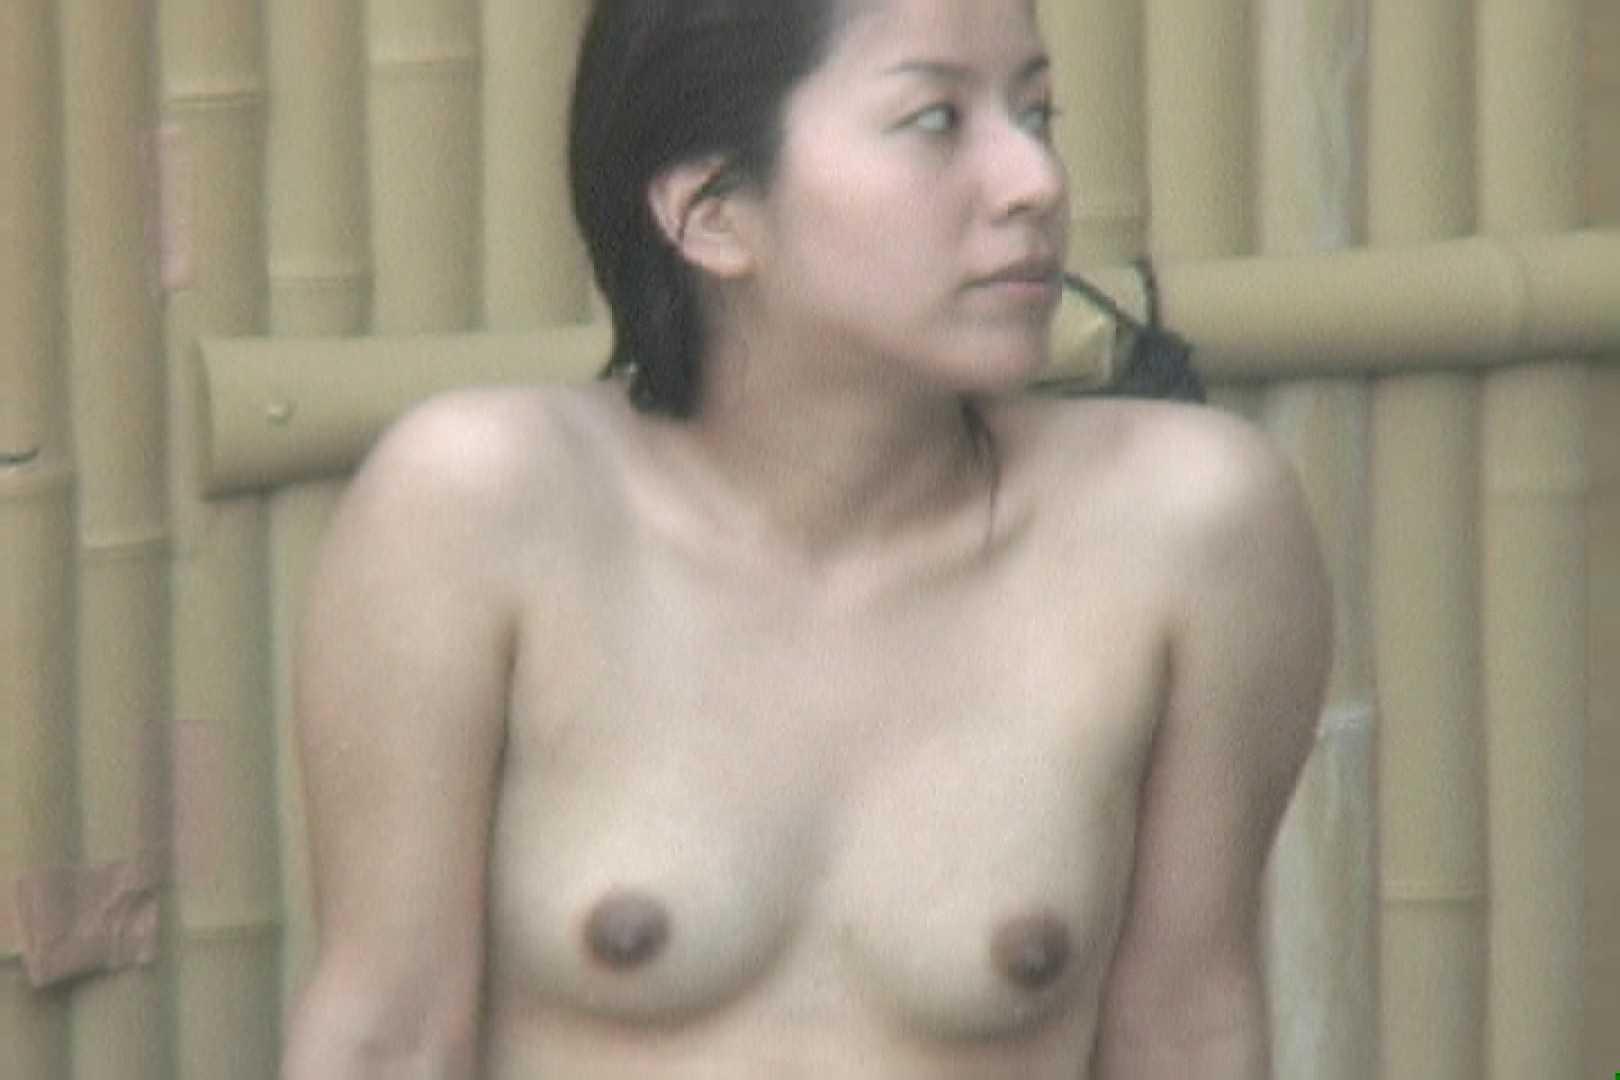 Aquaな露天風呂Vol.694 露天 | OLセックス  67画像 43